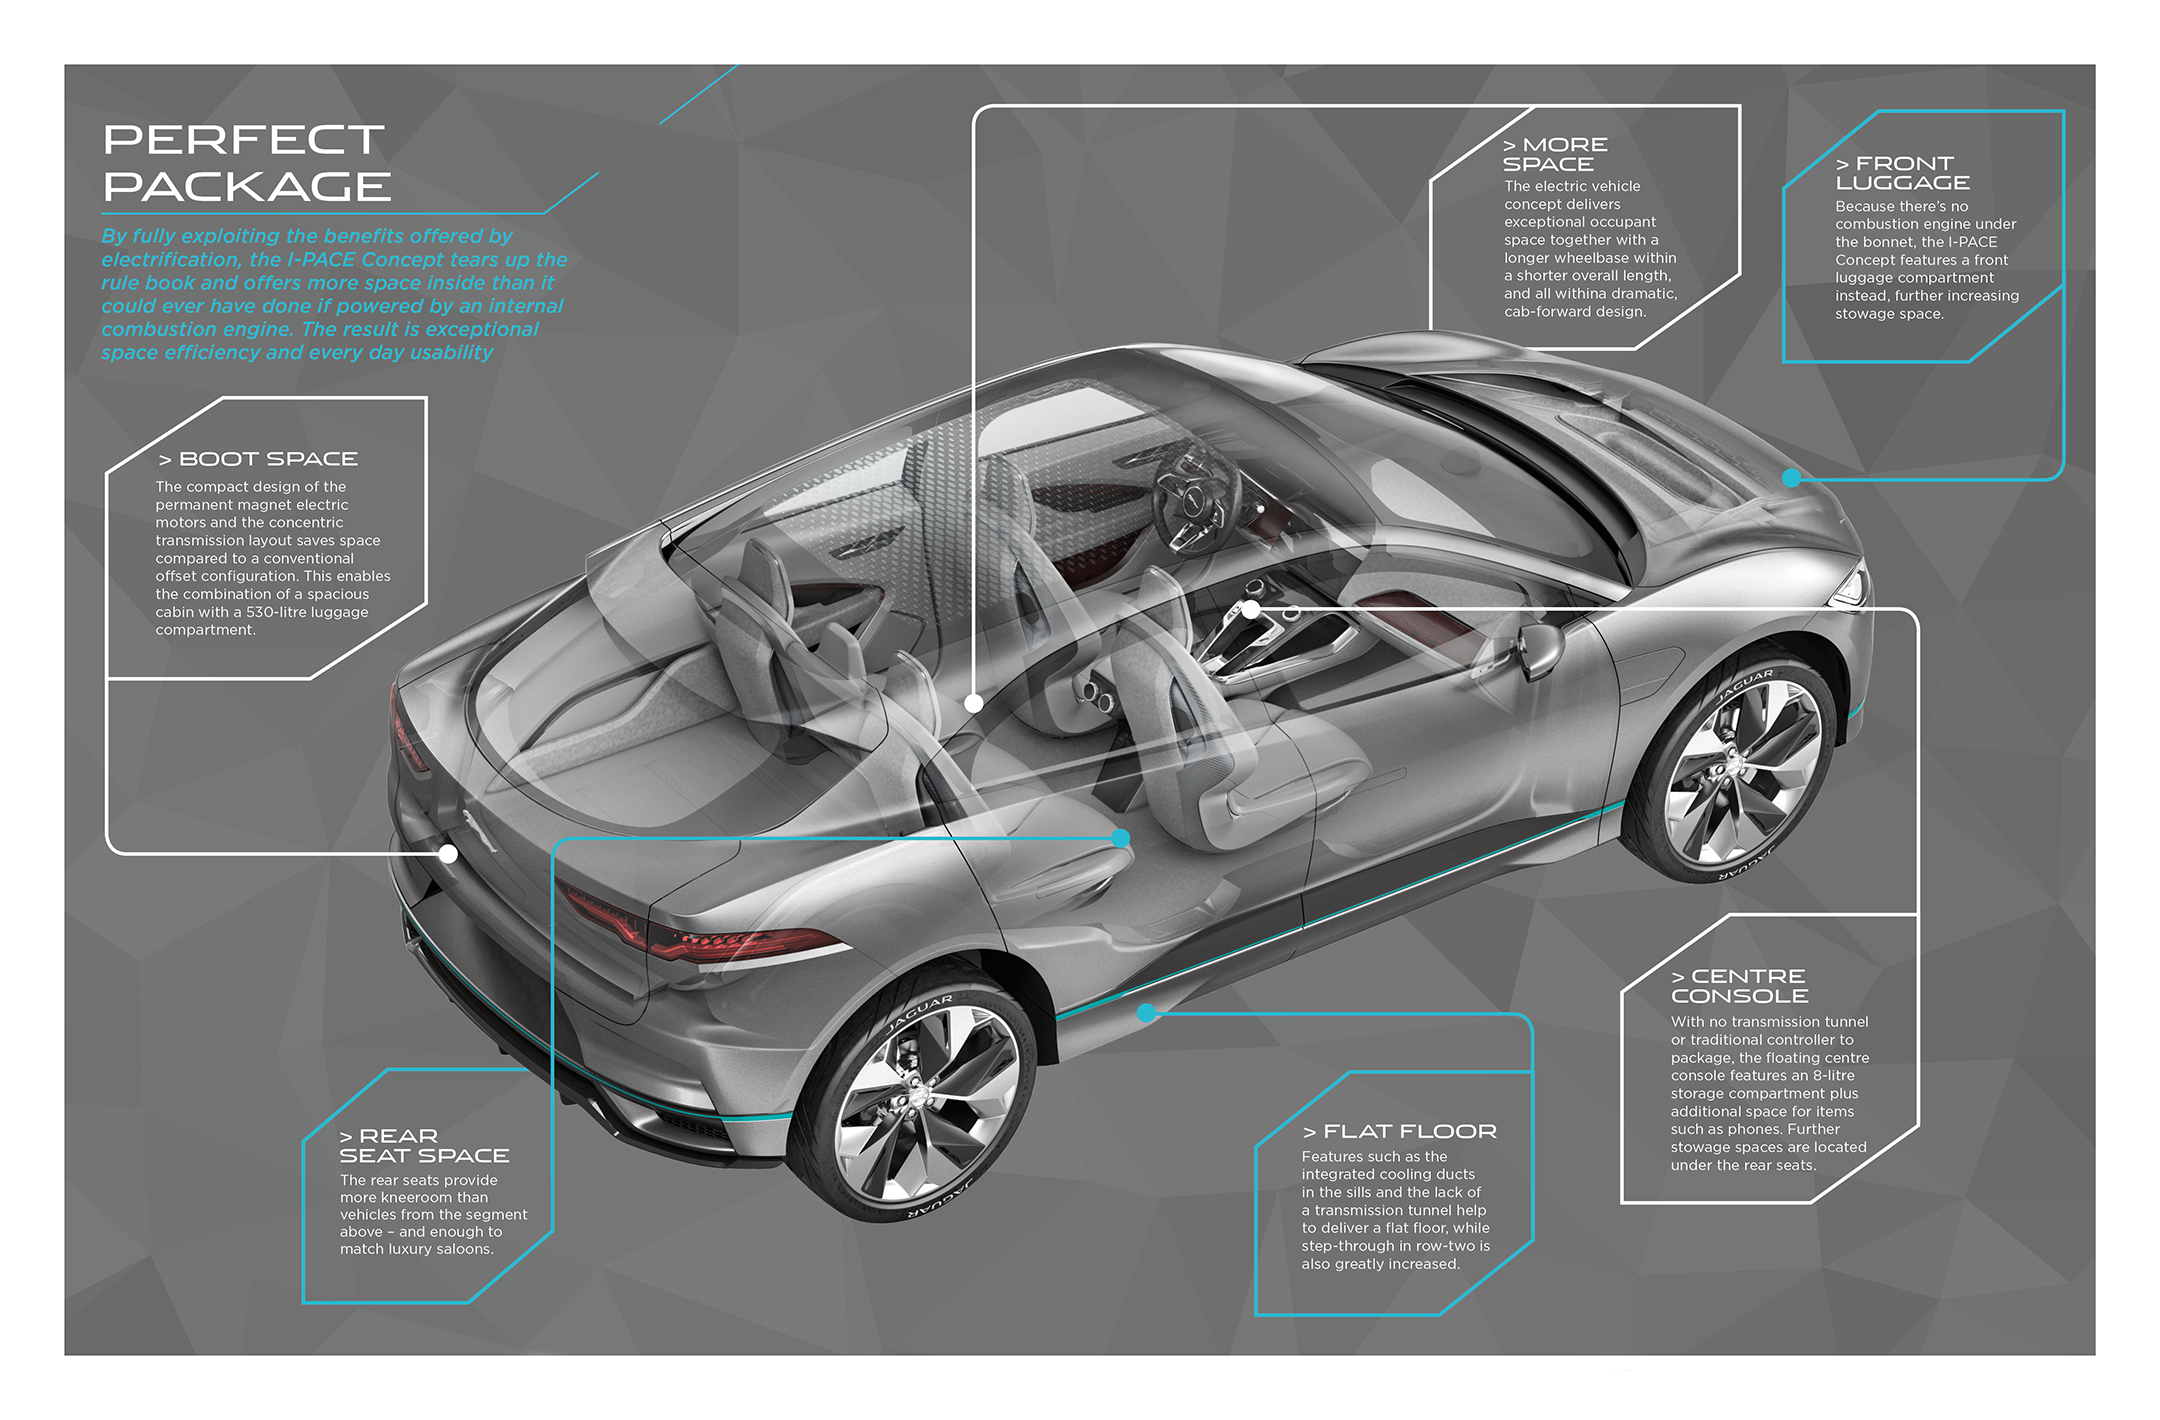 Jaguar I-PACE Concept - 2016 - interior infographic